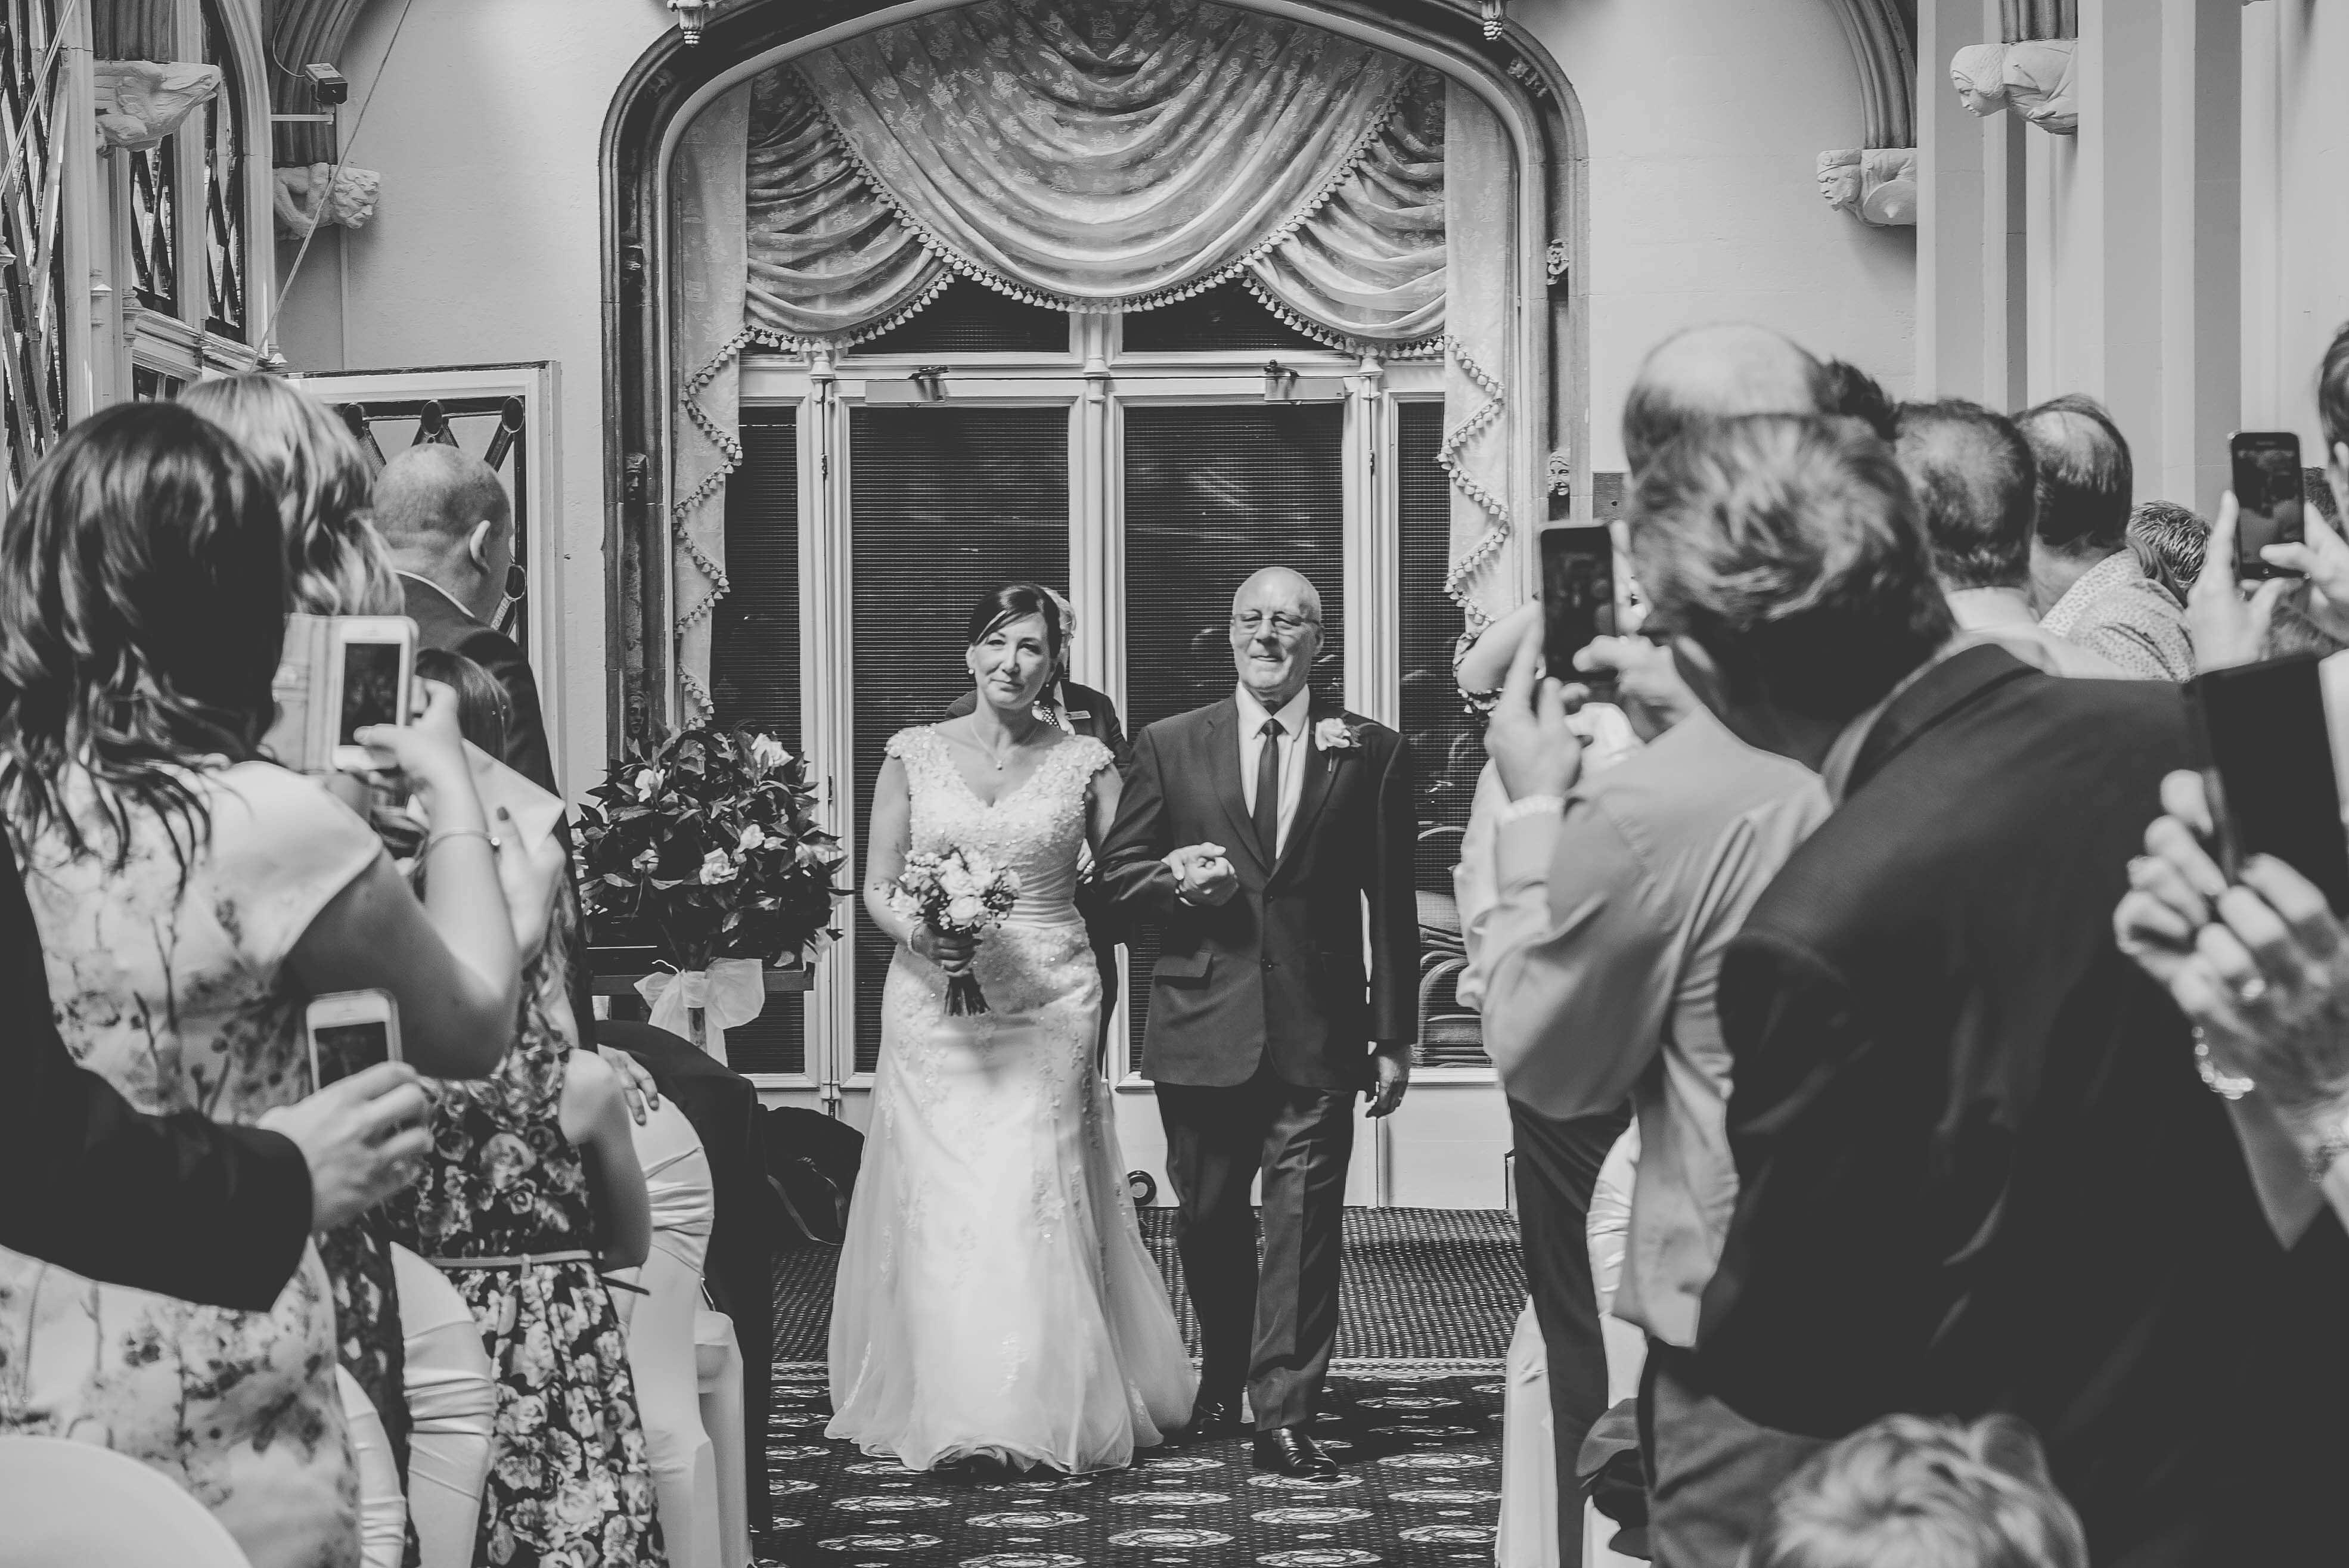 Orton Hall Wedding 11 11 2016 11